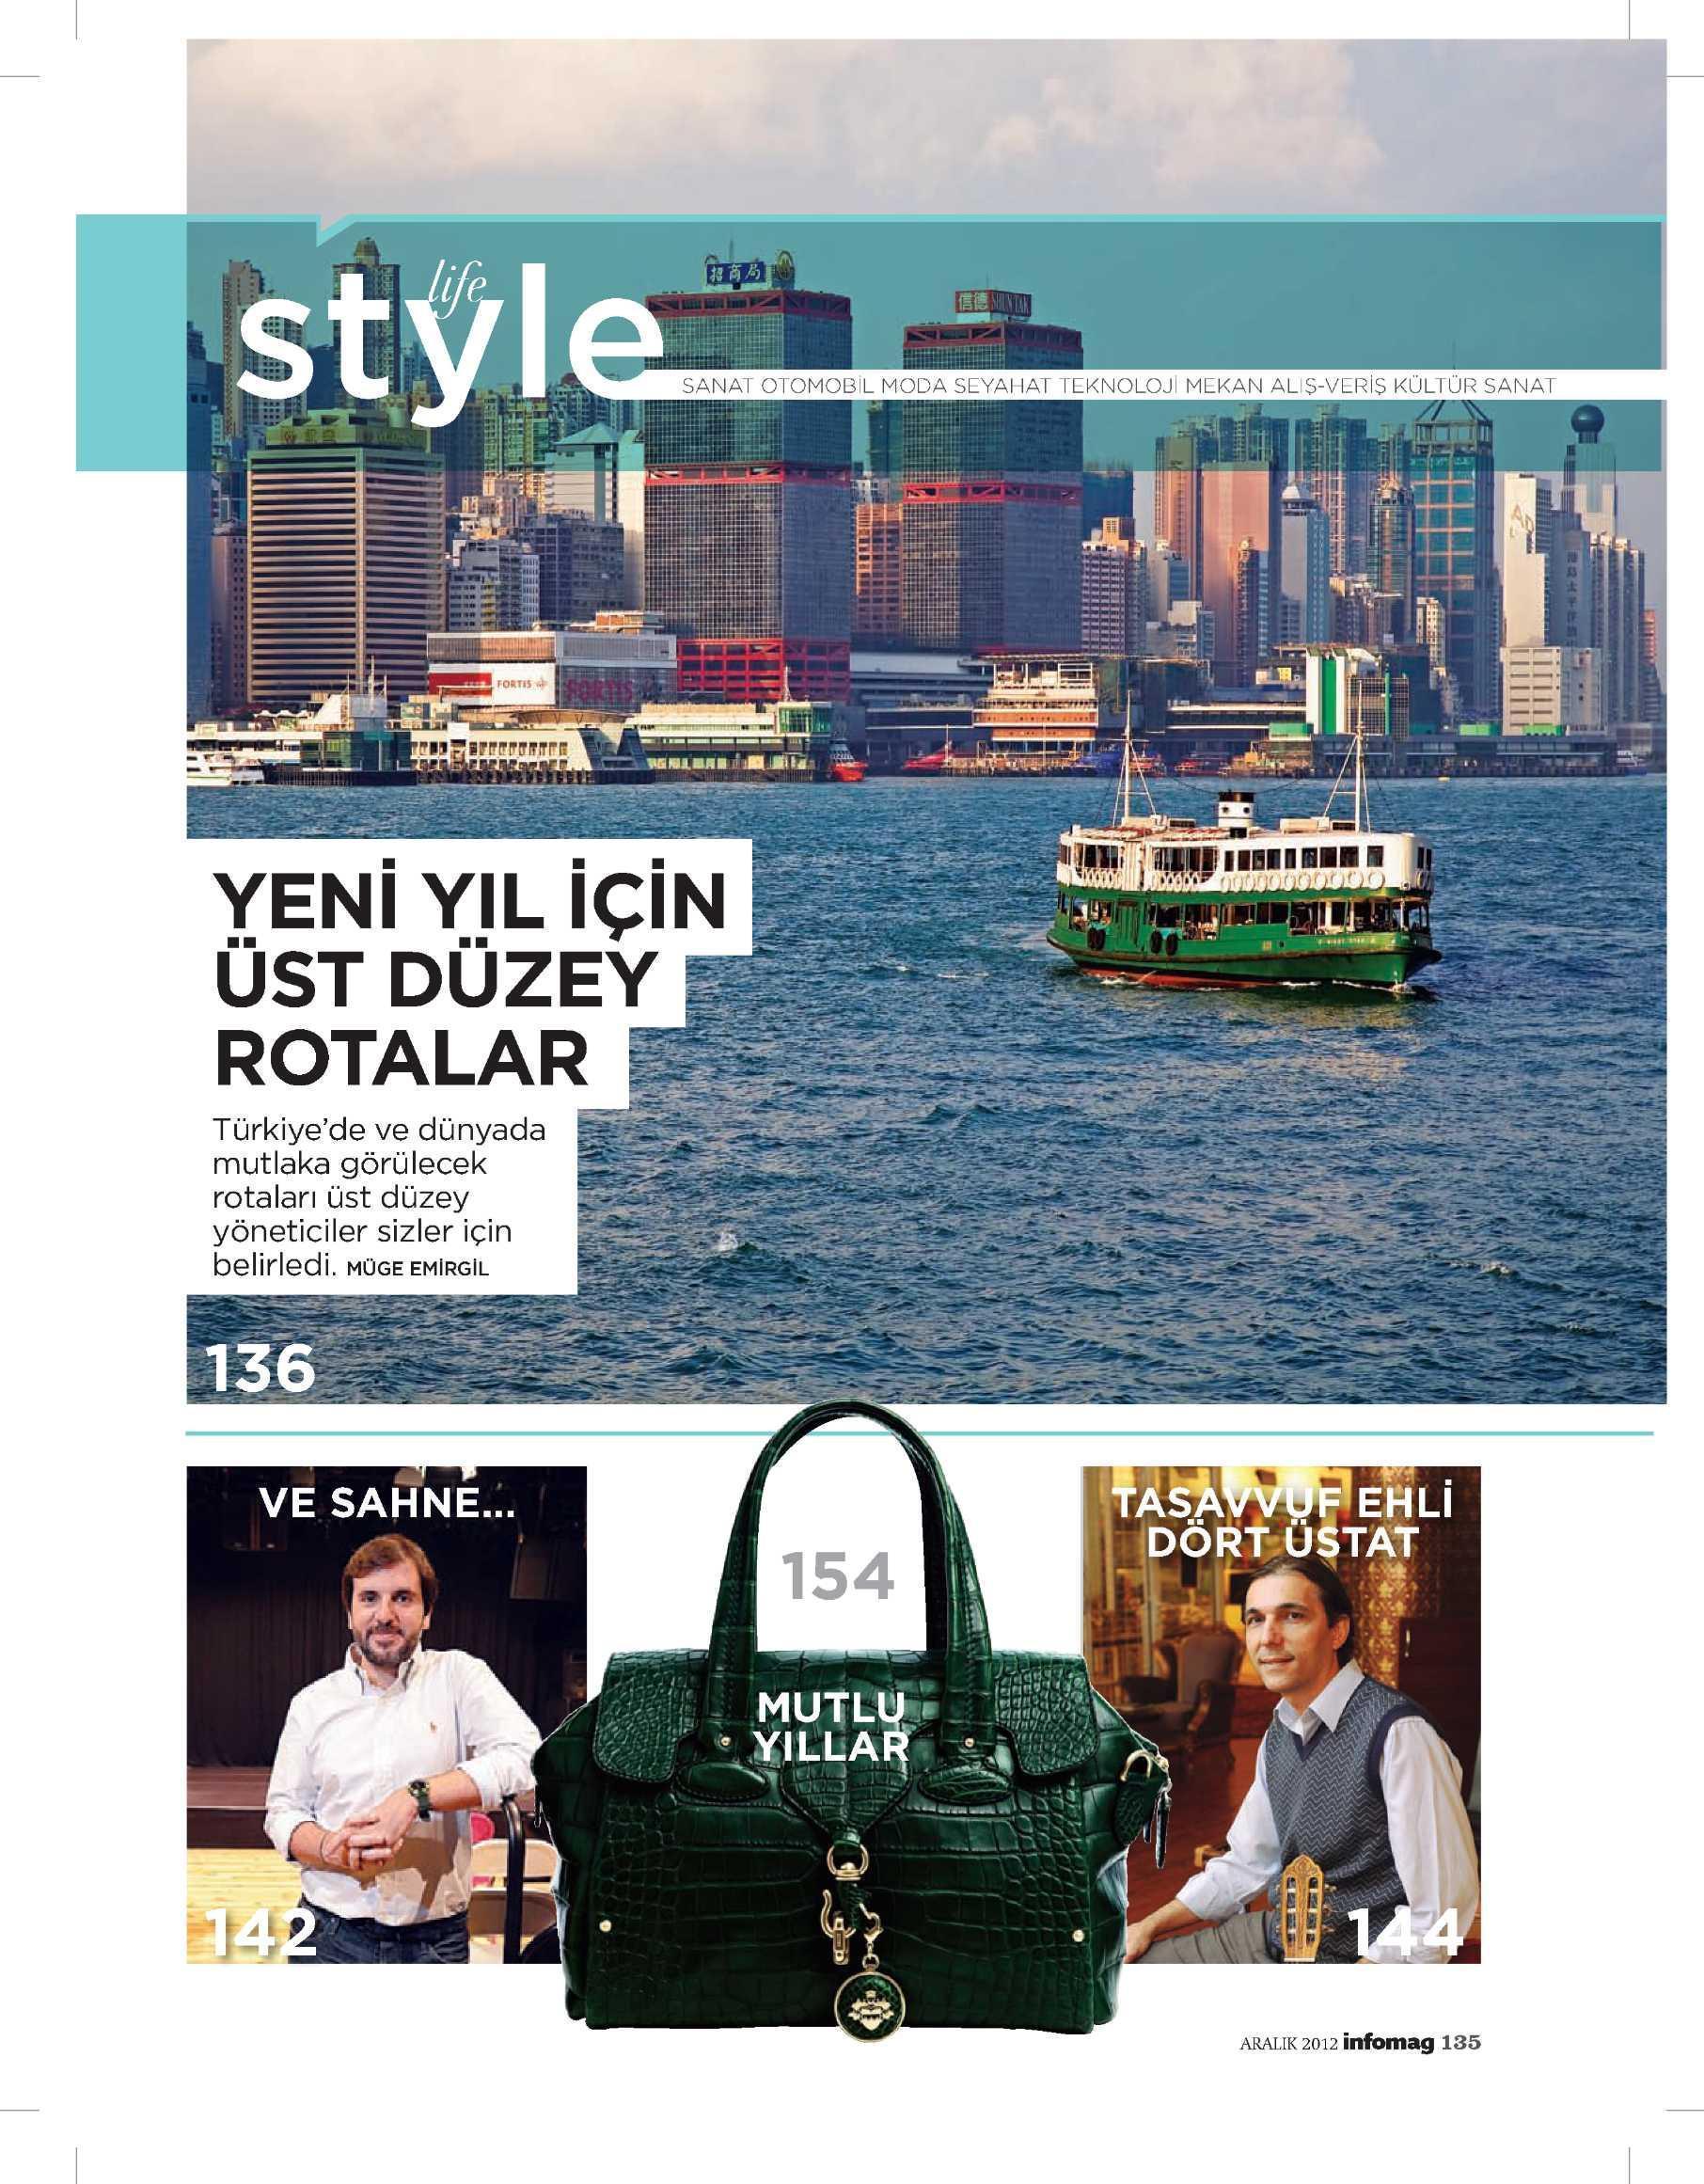 Netmarble-Turkey-Infomag-Dergisi-Aralik-2012-Sayfa-135-1